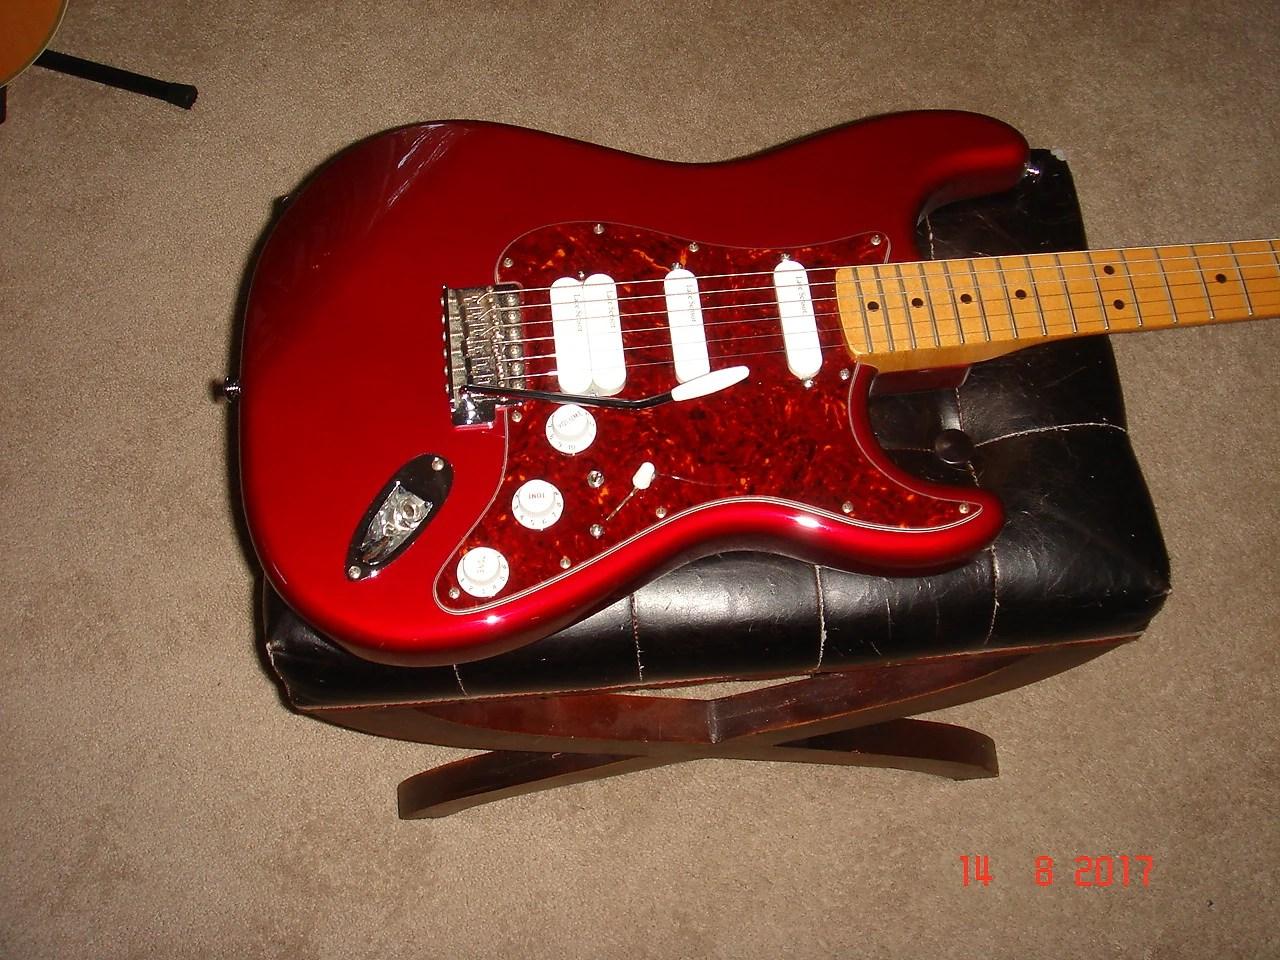 hight resolution of https reverb com item 22677181 fender stratocaster with gold lace sensor pickups